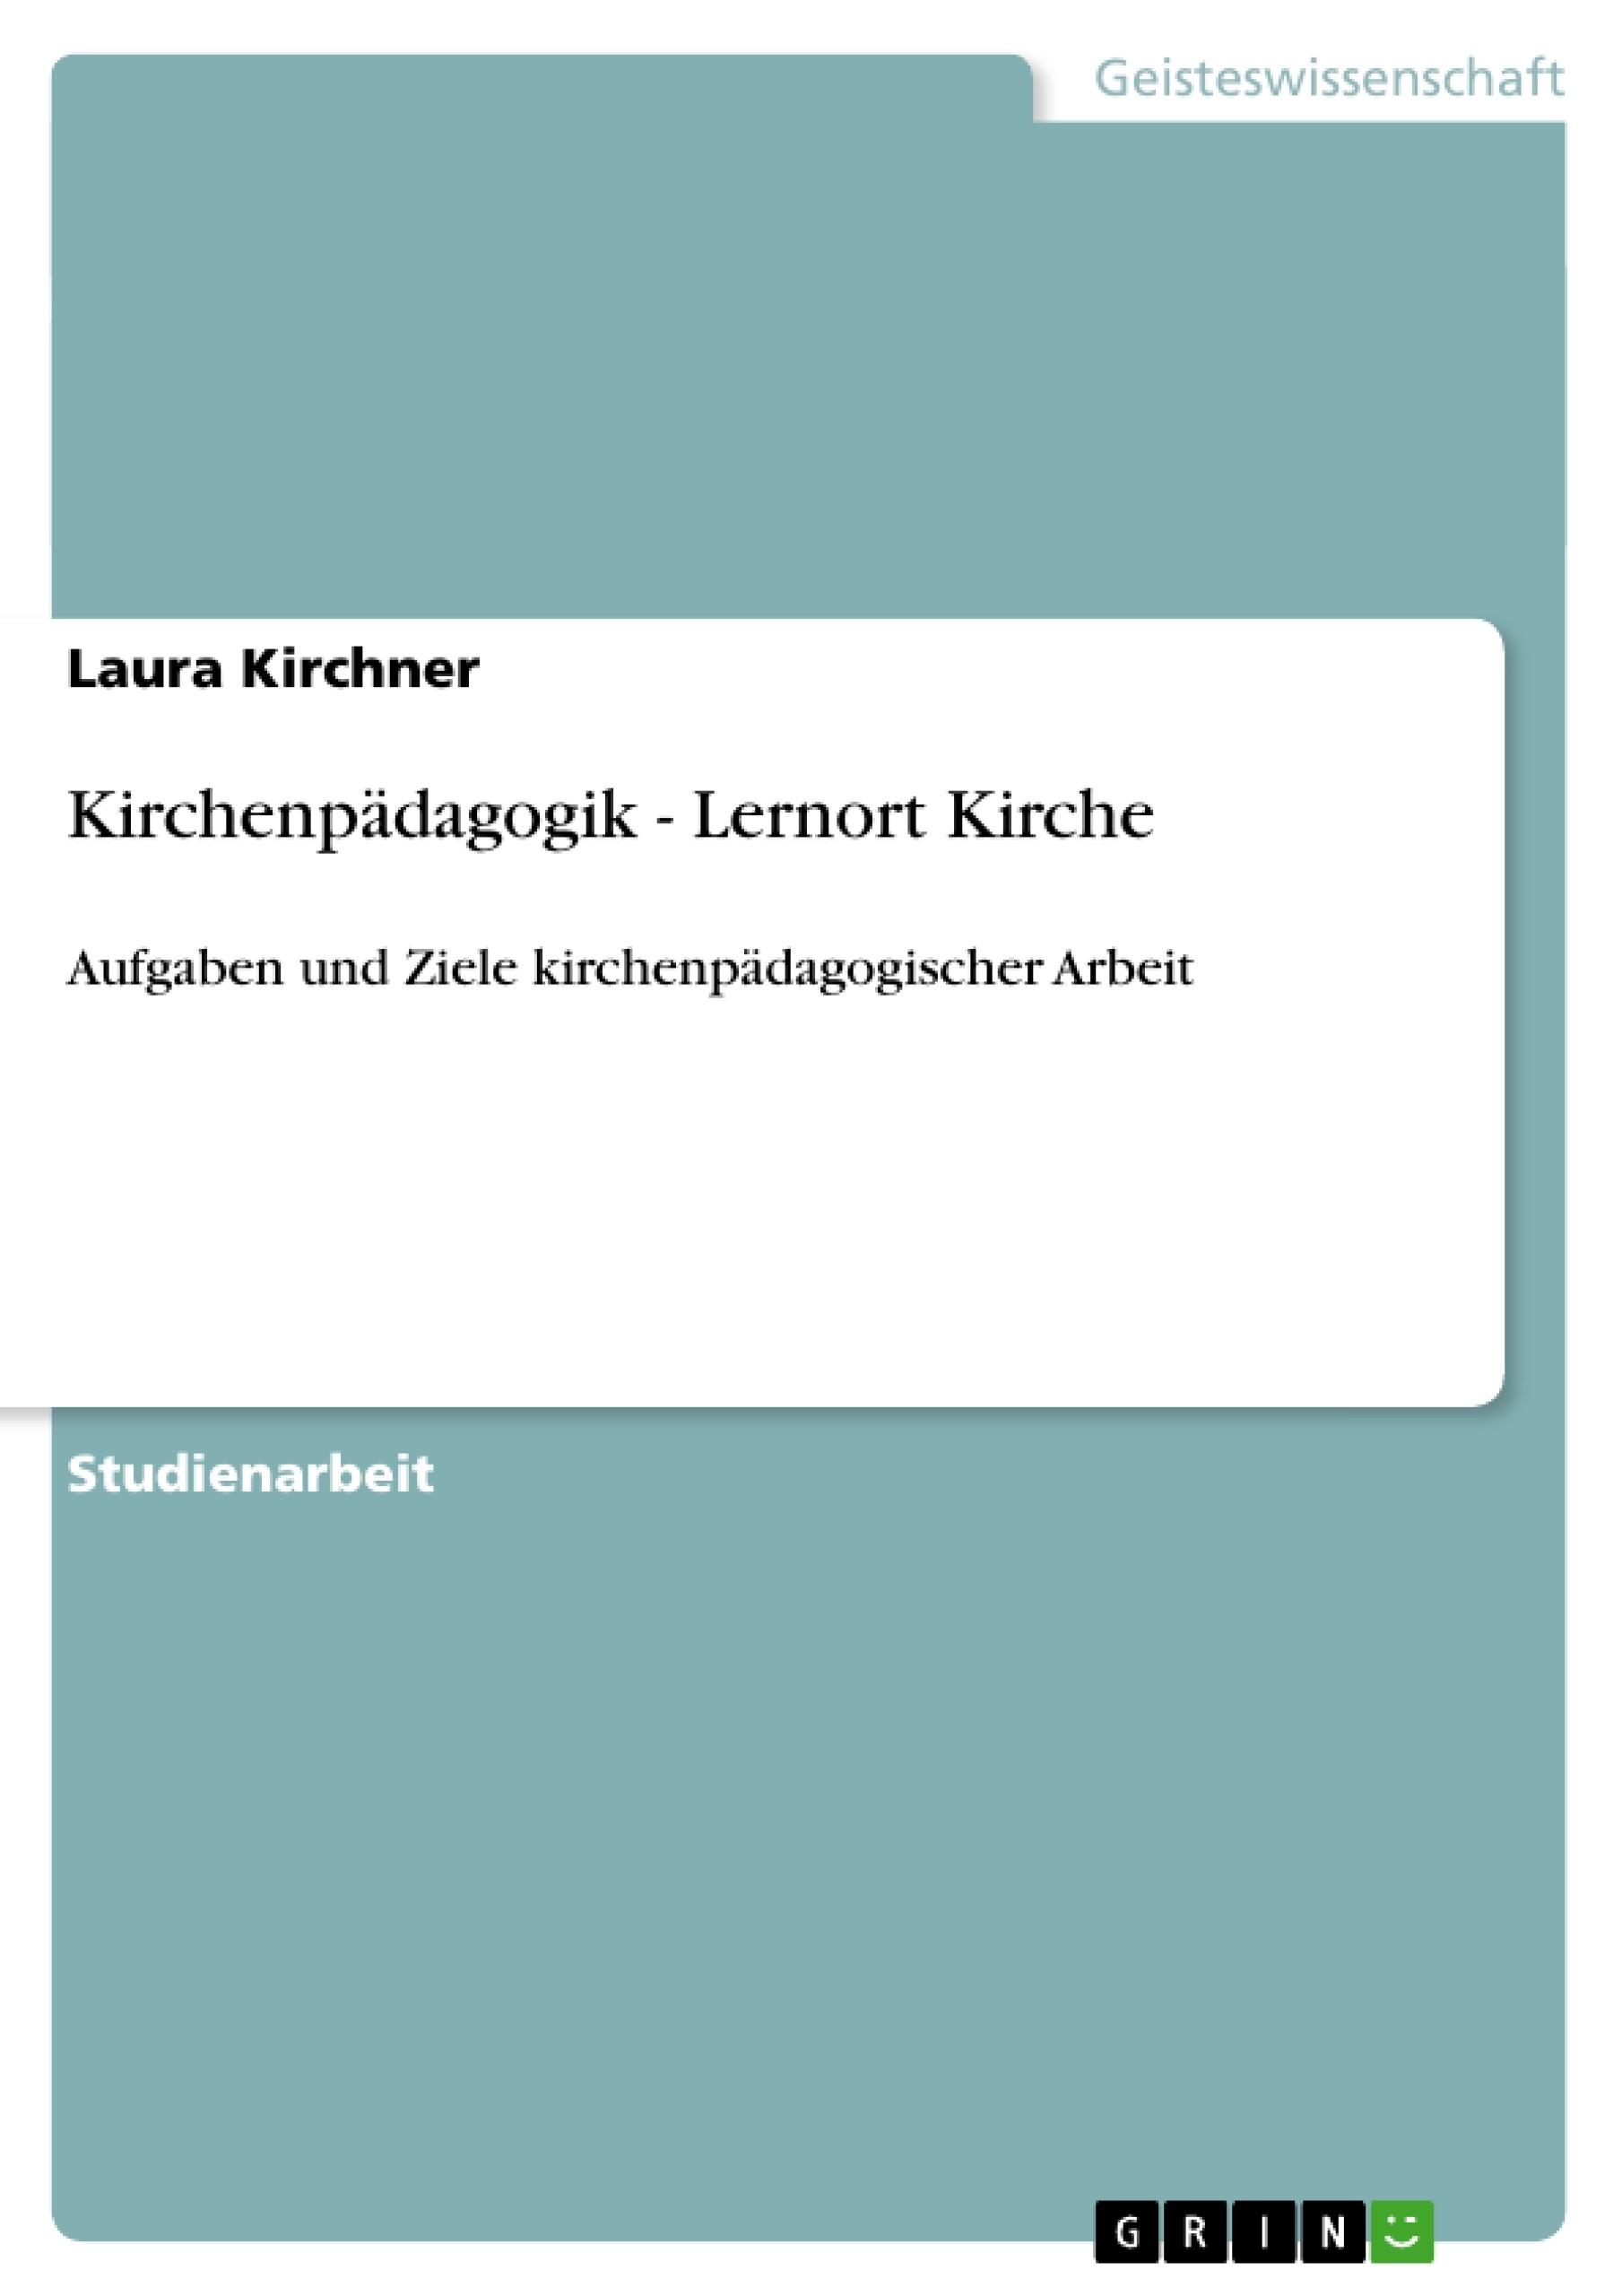 Titel: Kirchenpädagogik - Lernort Kirche